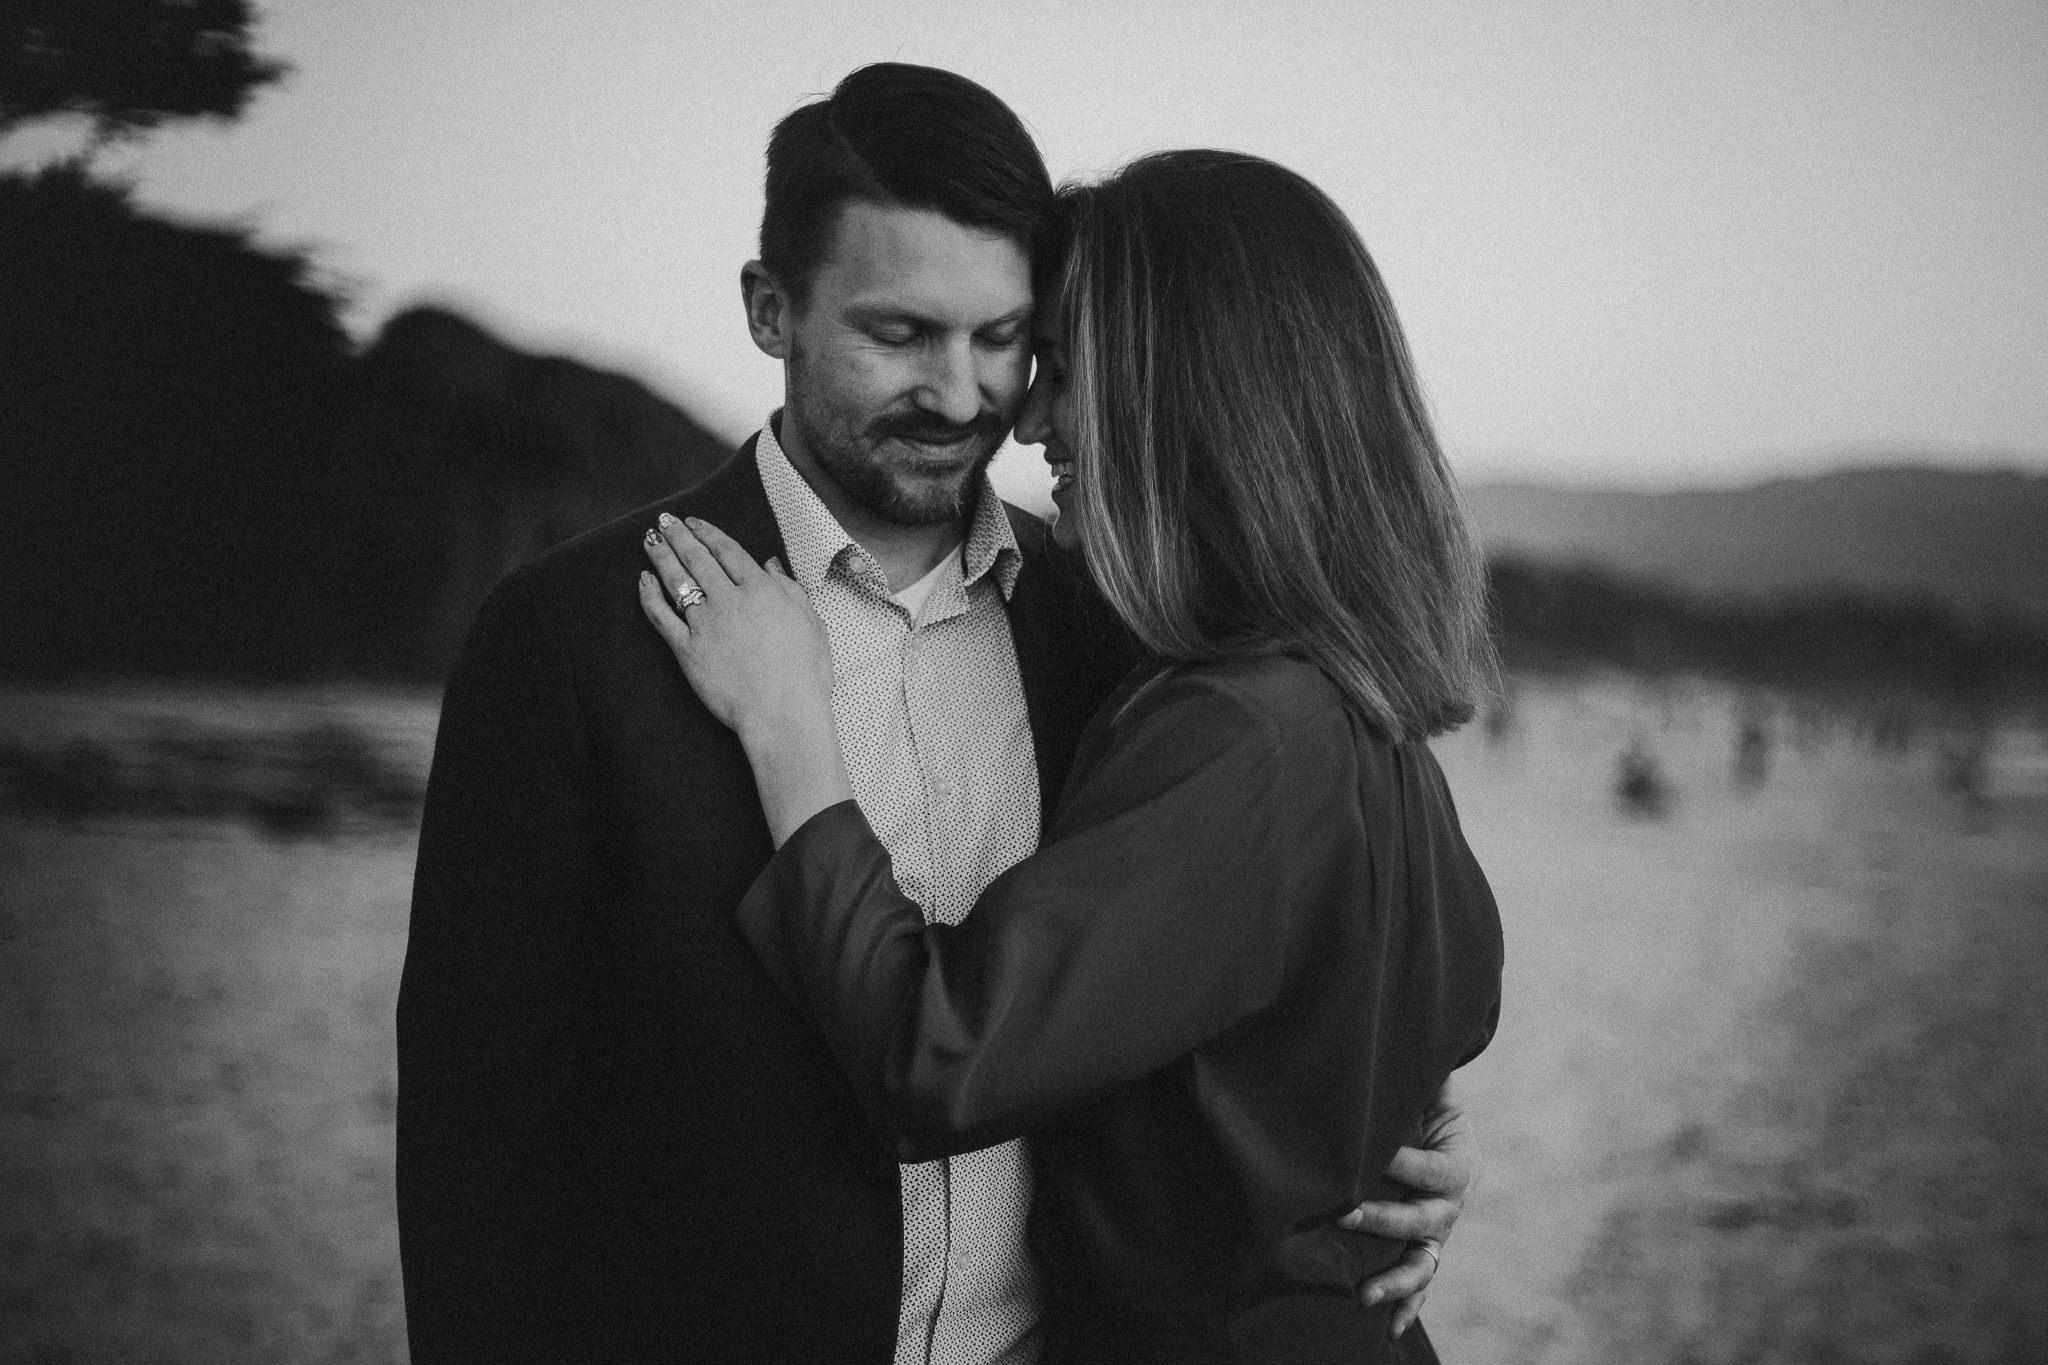 Archer Inspired Photography Carmel Beach California Wedding Engagement Lifestyle Anniversary Natural Light Photographer-93.jpg